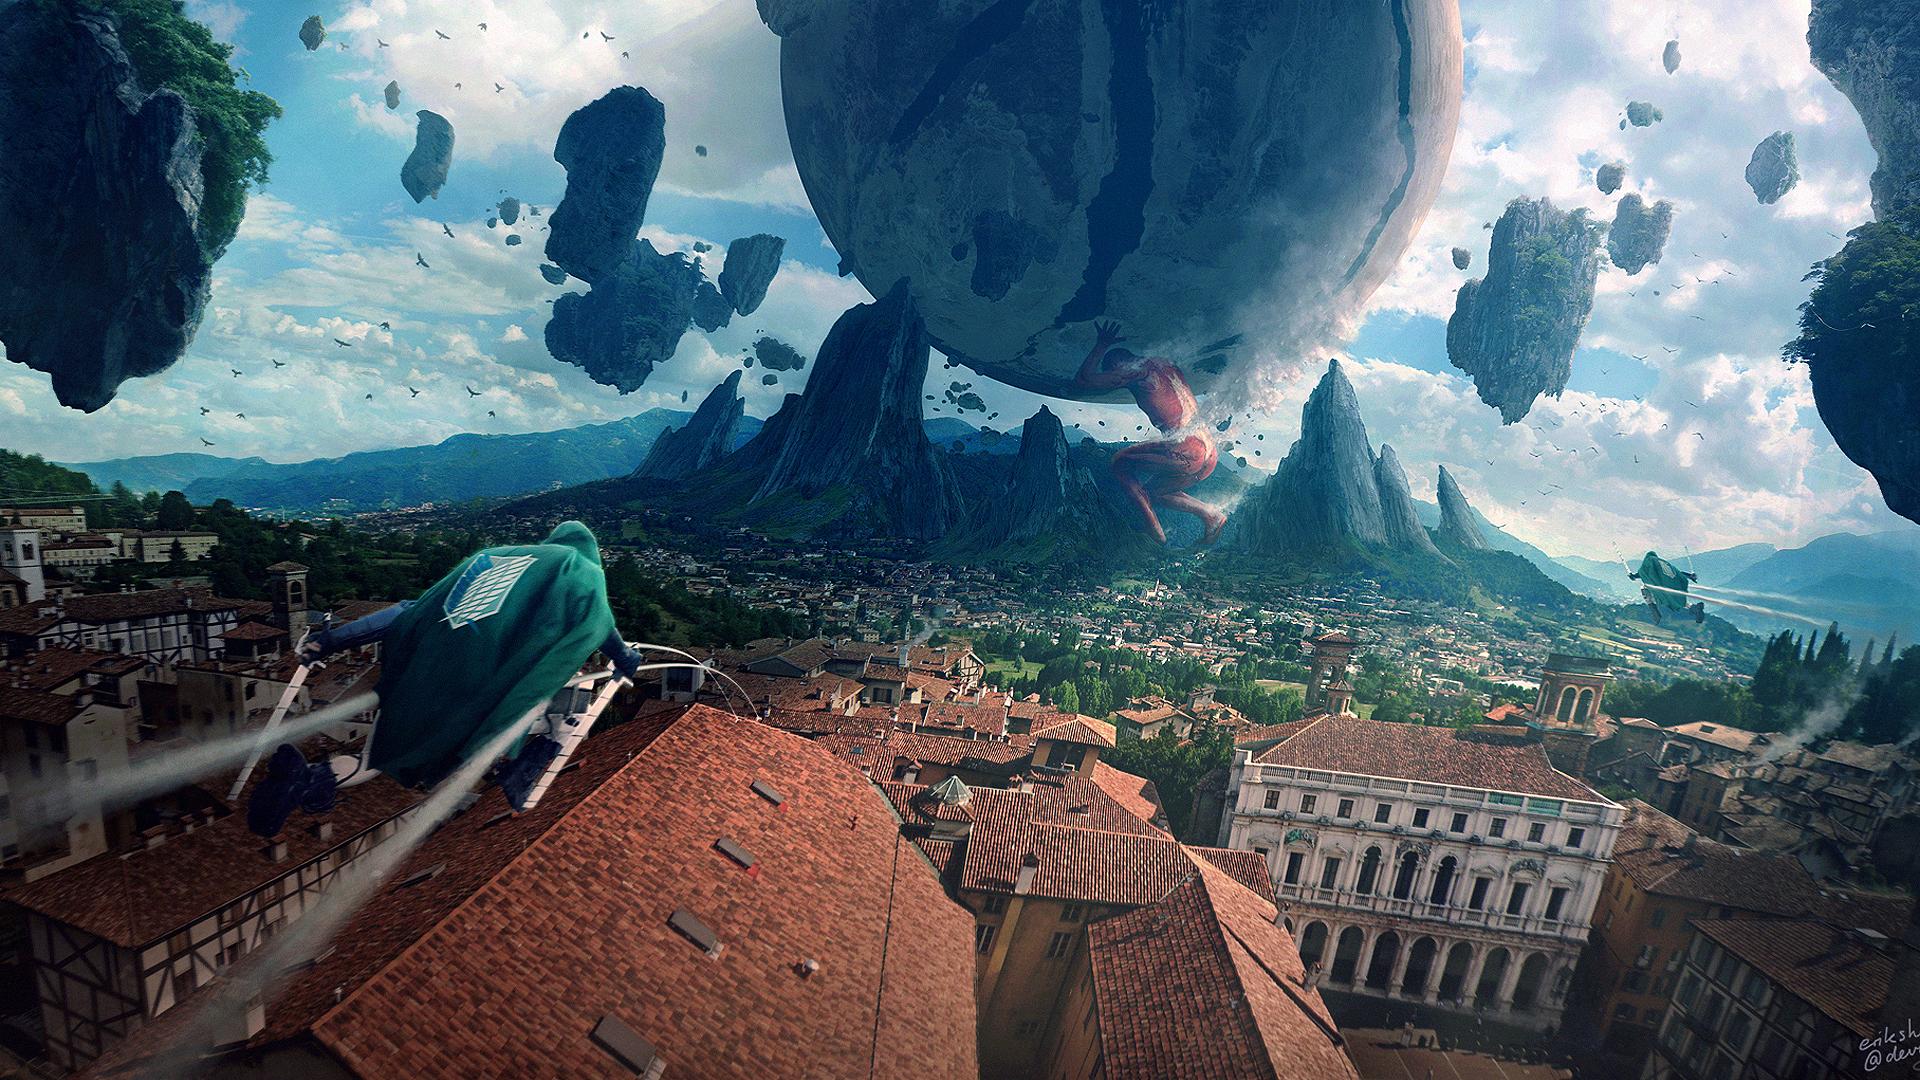 Wallpaper Erik Shoemaker Digital Art Artwork Attack On Titans